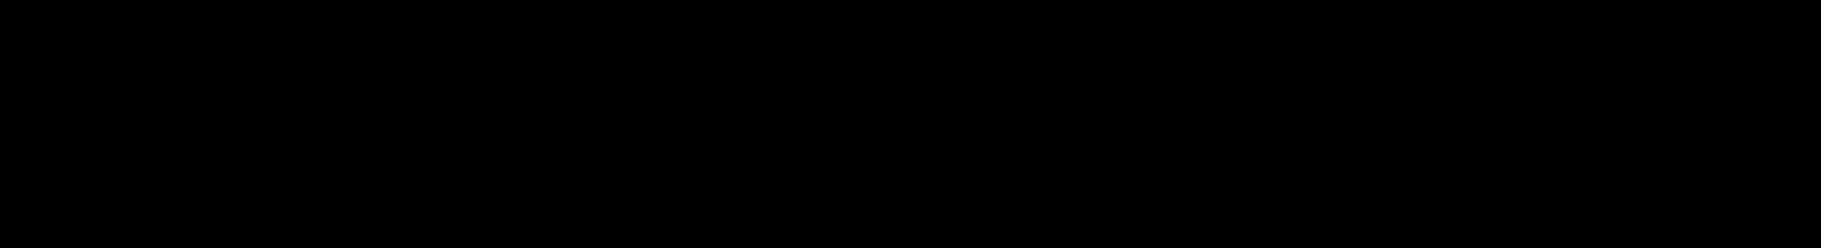 Strona producenta SENNHEISER